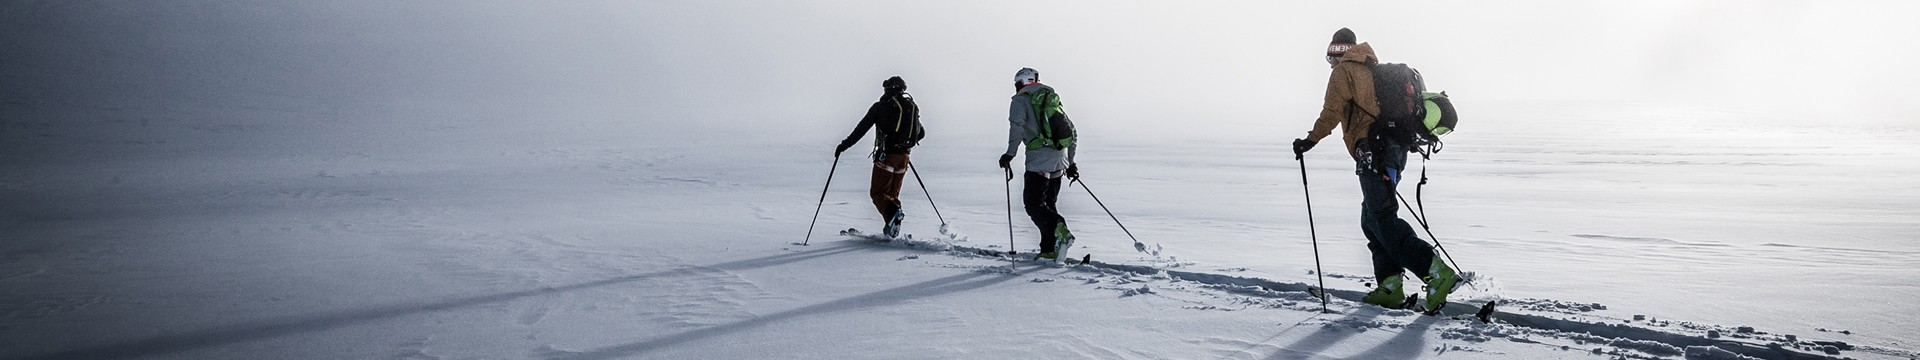 ski-rando-01-8787